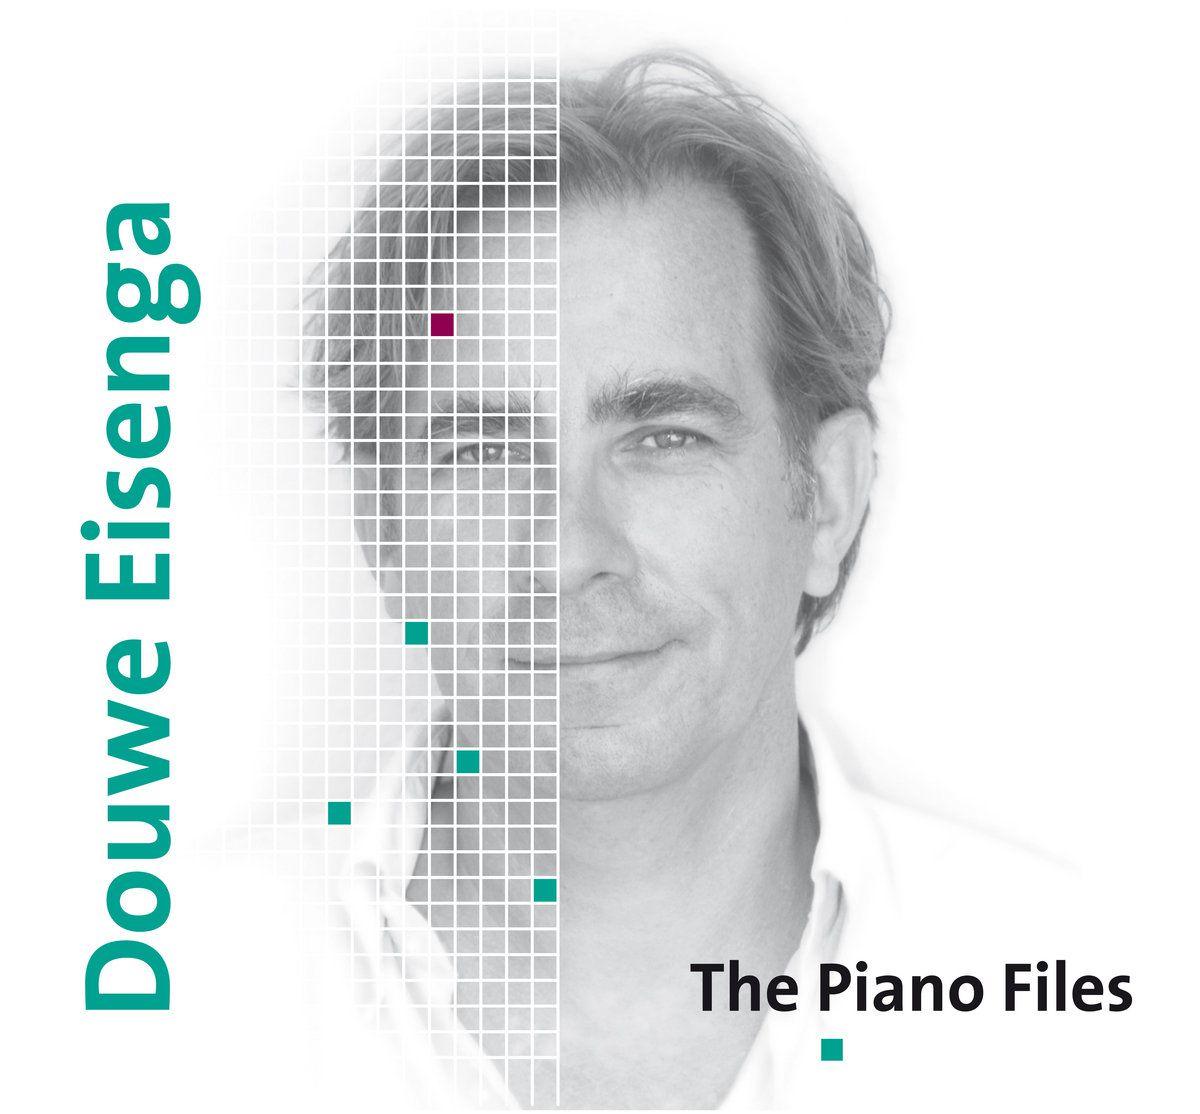 Douwe Eisenga - The Piano Files : eaux d'artifice minimalistes.